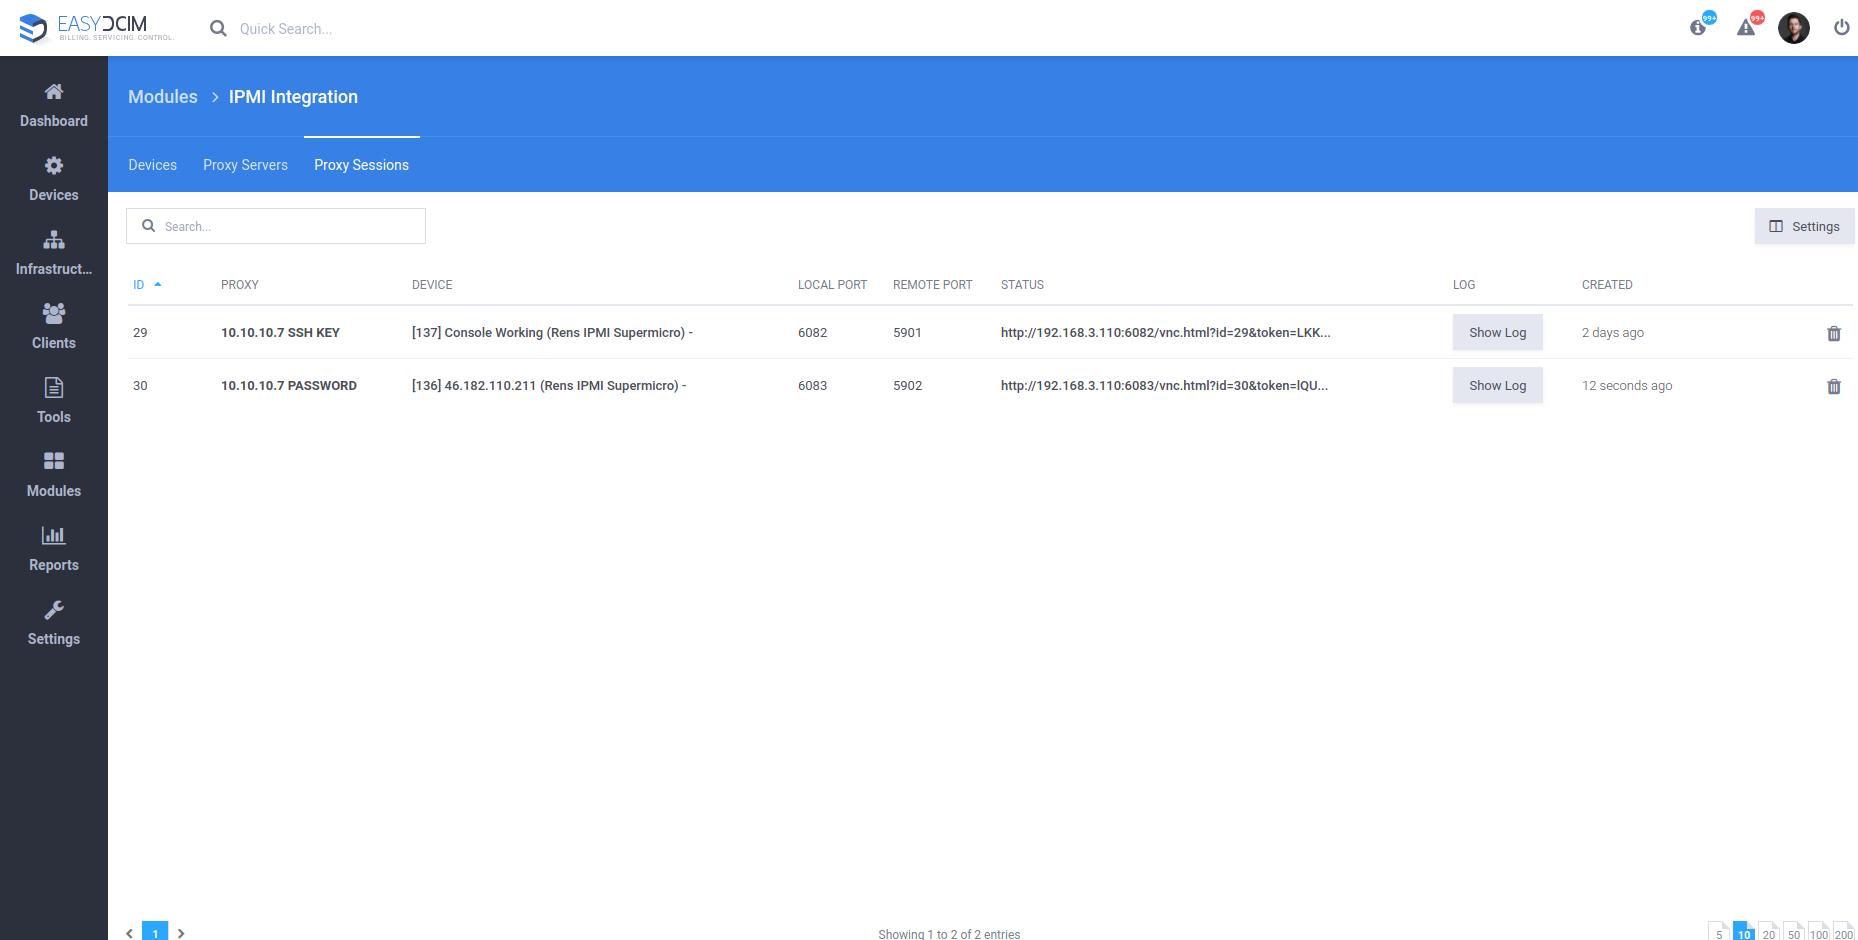 IPMI Proxy Configuration - EasyDCIM v1.5.2